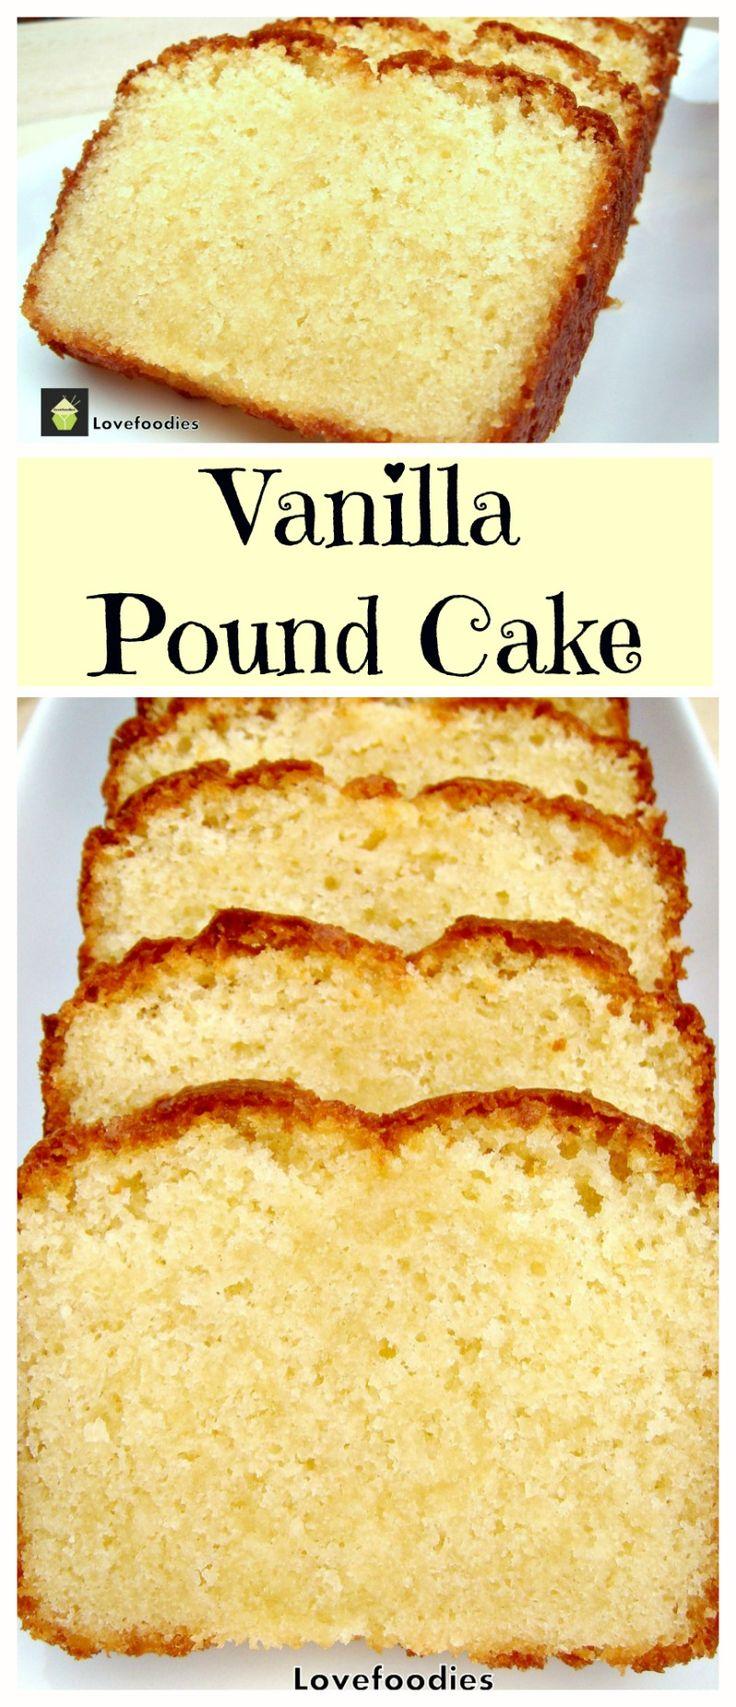 Moist Vanilla Pound Cake. Easy Recipe and absolutely wonderful! Freezer friendly too.